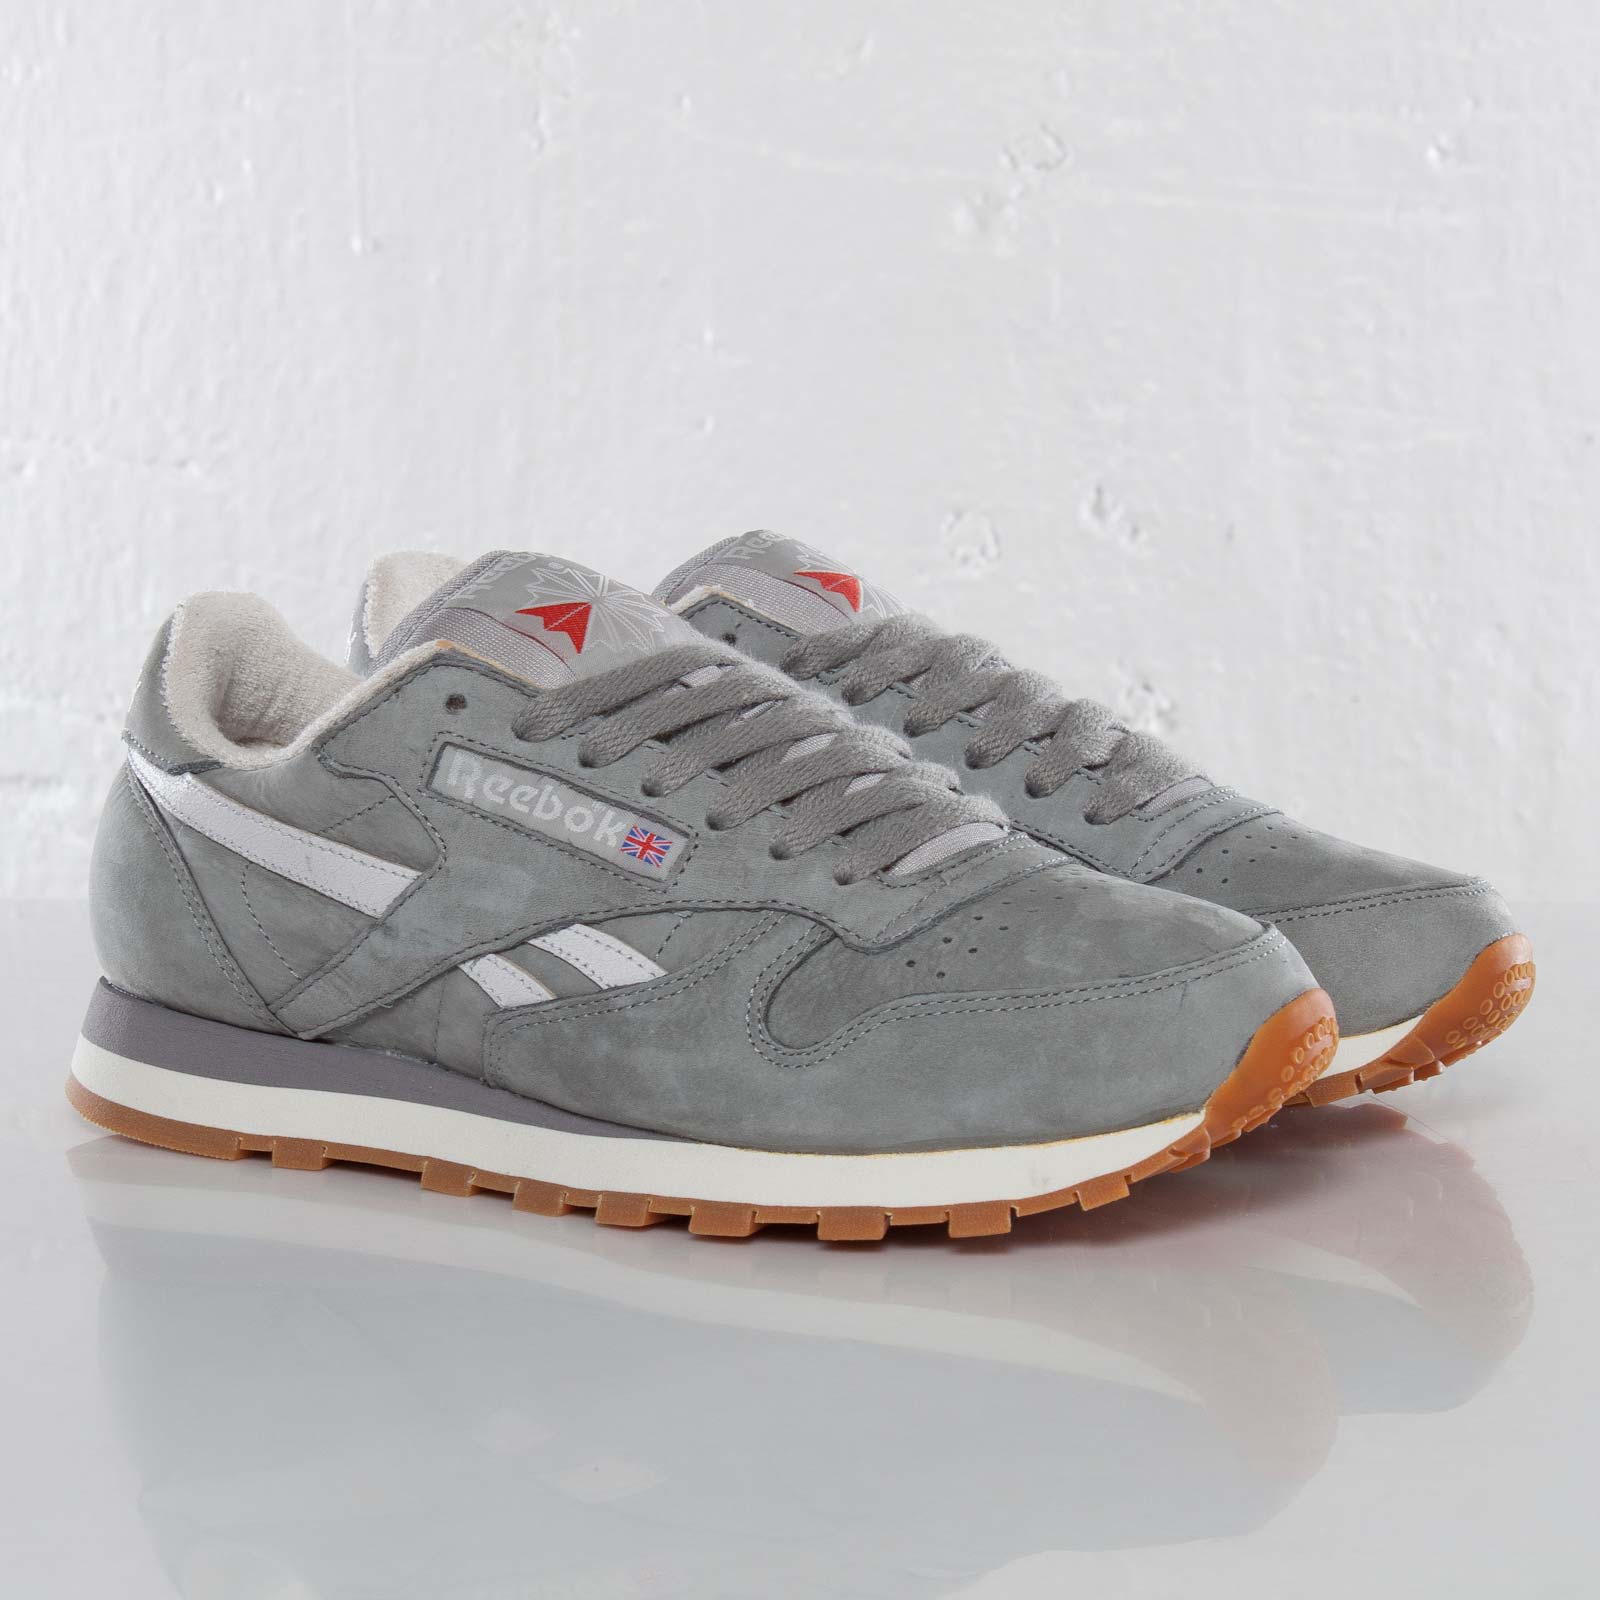 f067e84d1c01a Reebok Classic Leather Vintage - J97403 - Sneakersnstuff